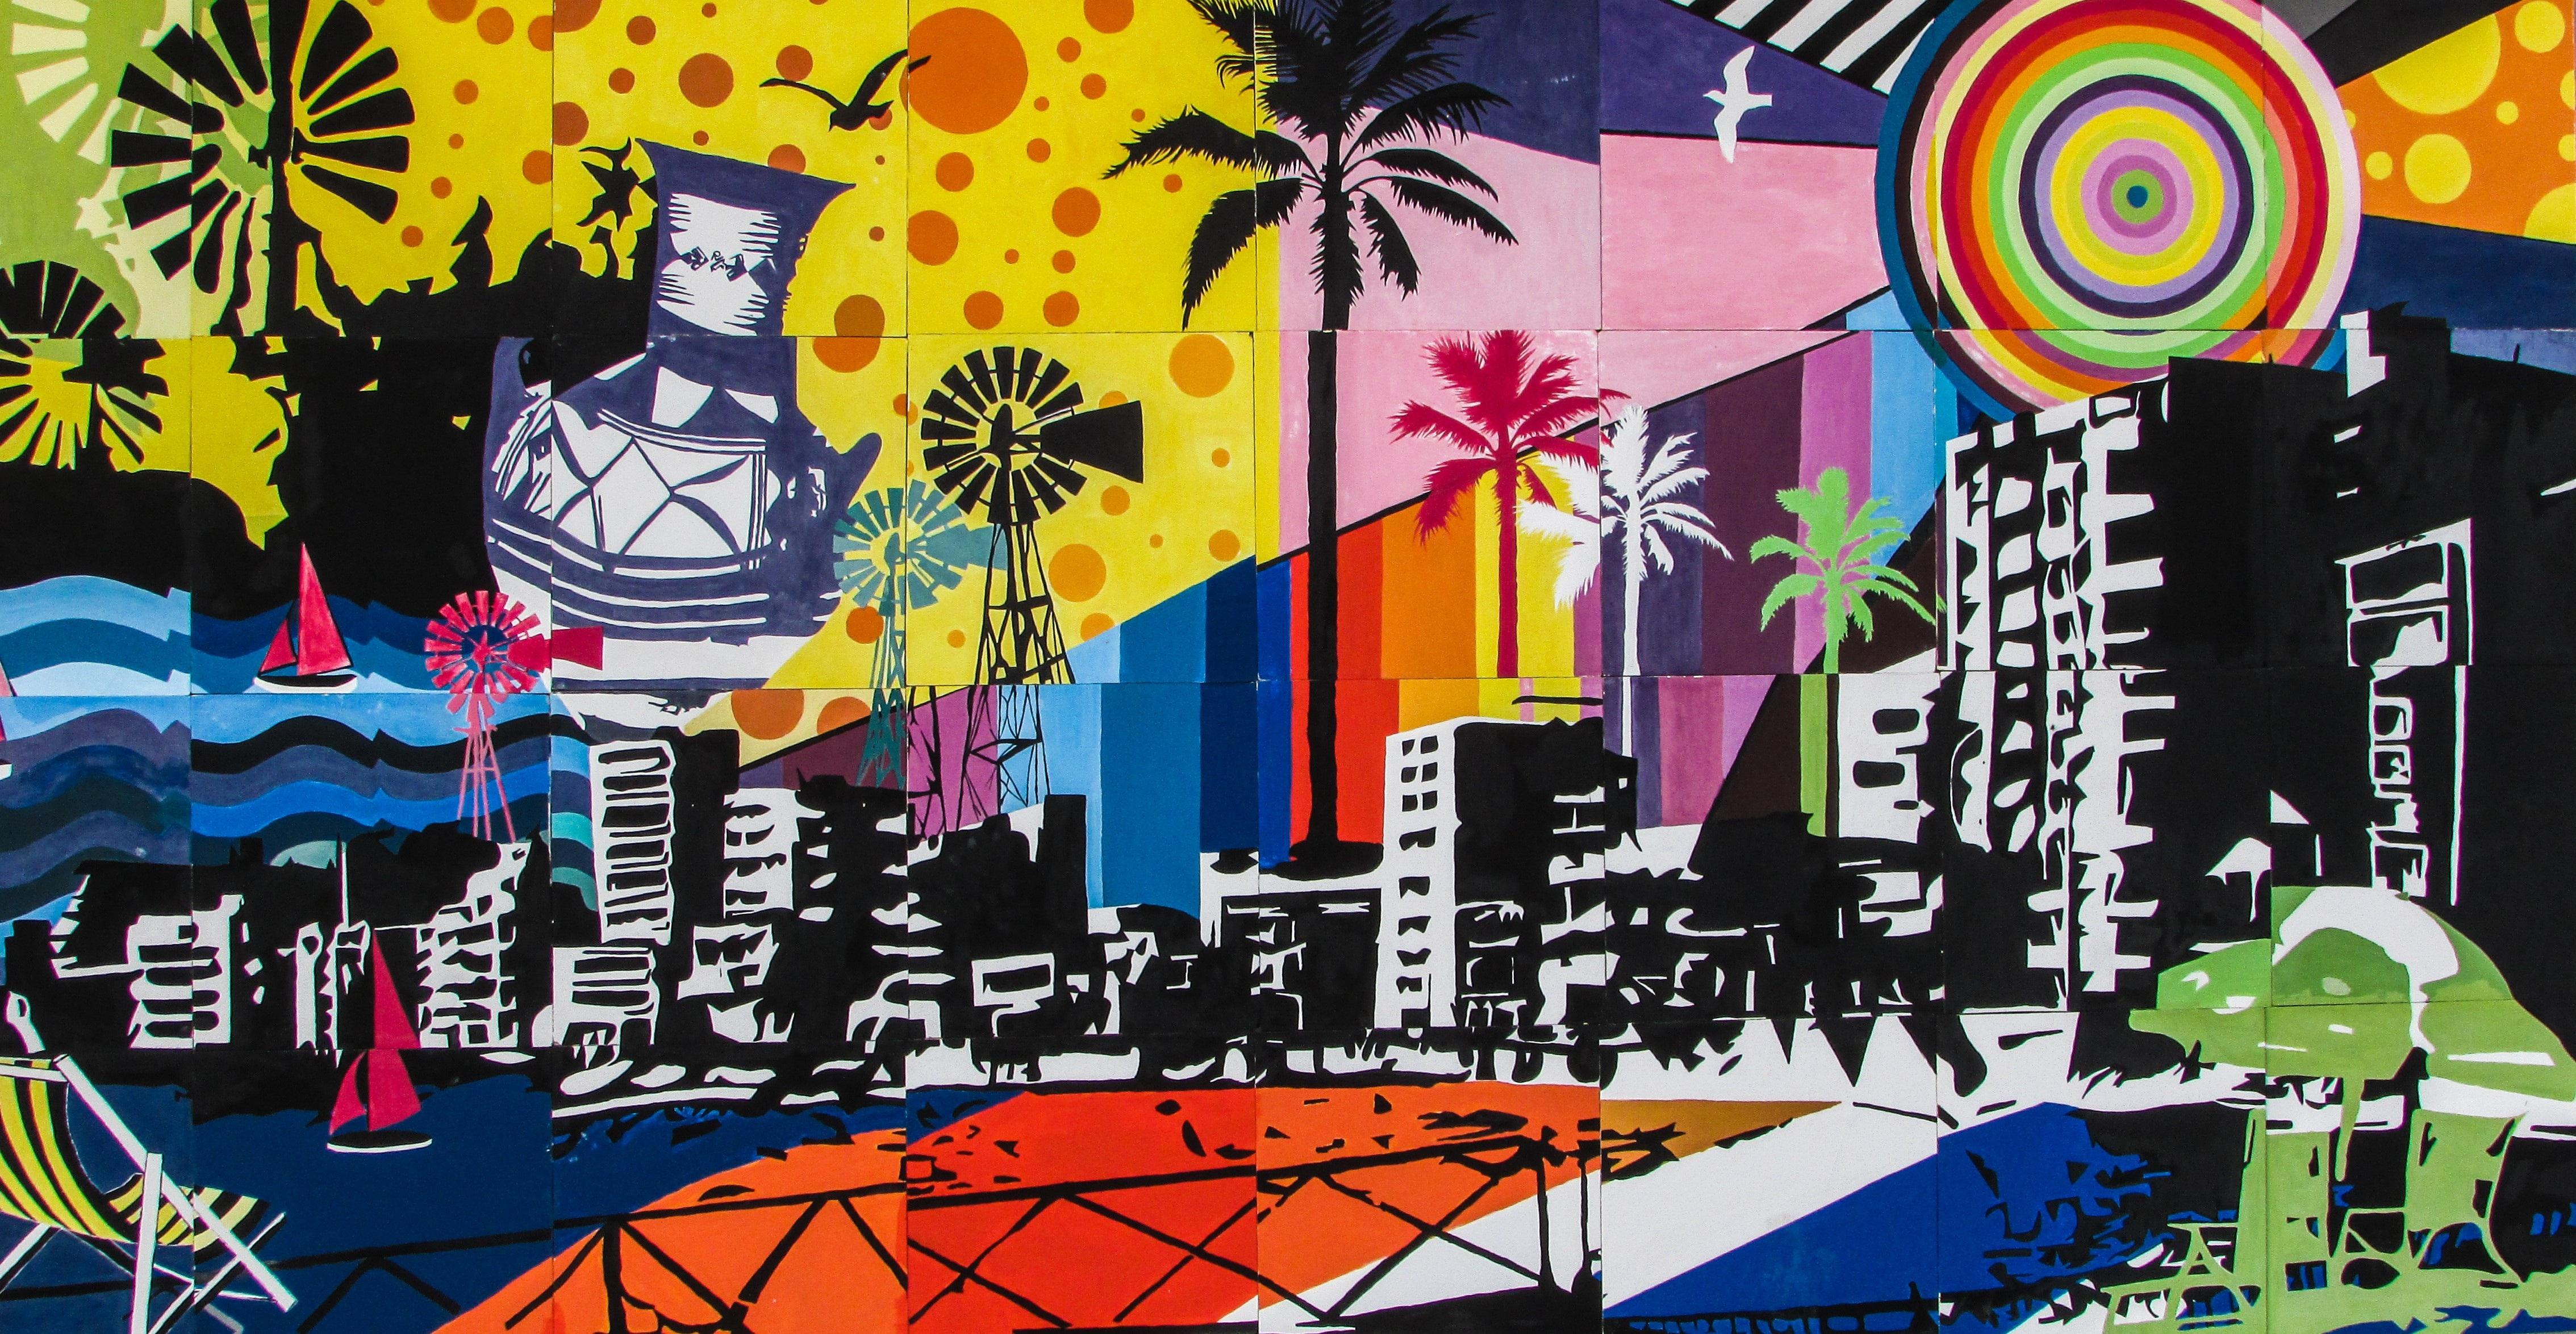 Colourful Tourism Graffiti Street Art Art Illustration Mural History Tradition Cyprus Paralimni Modern Art